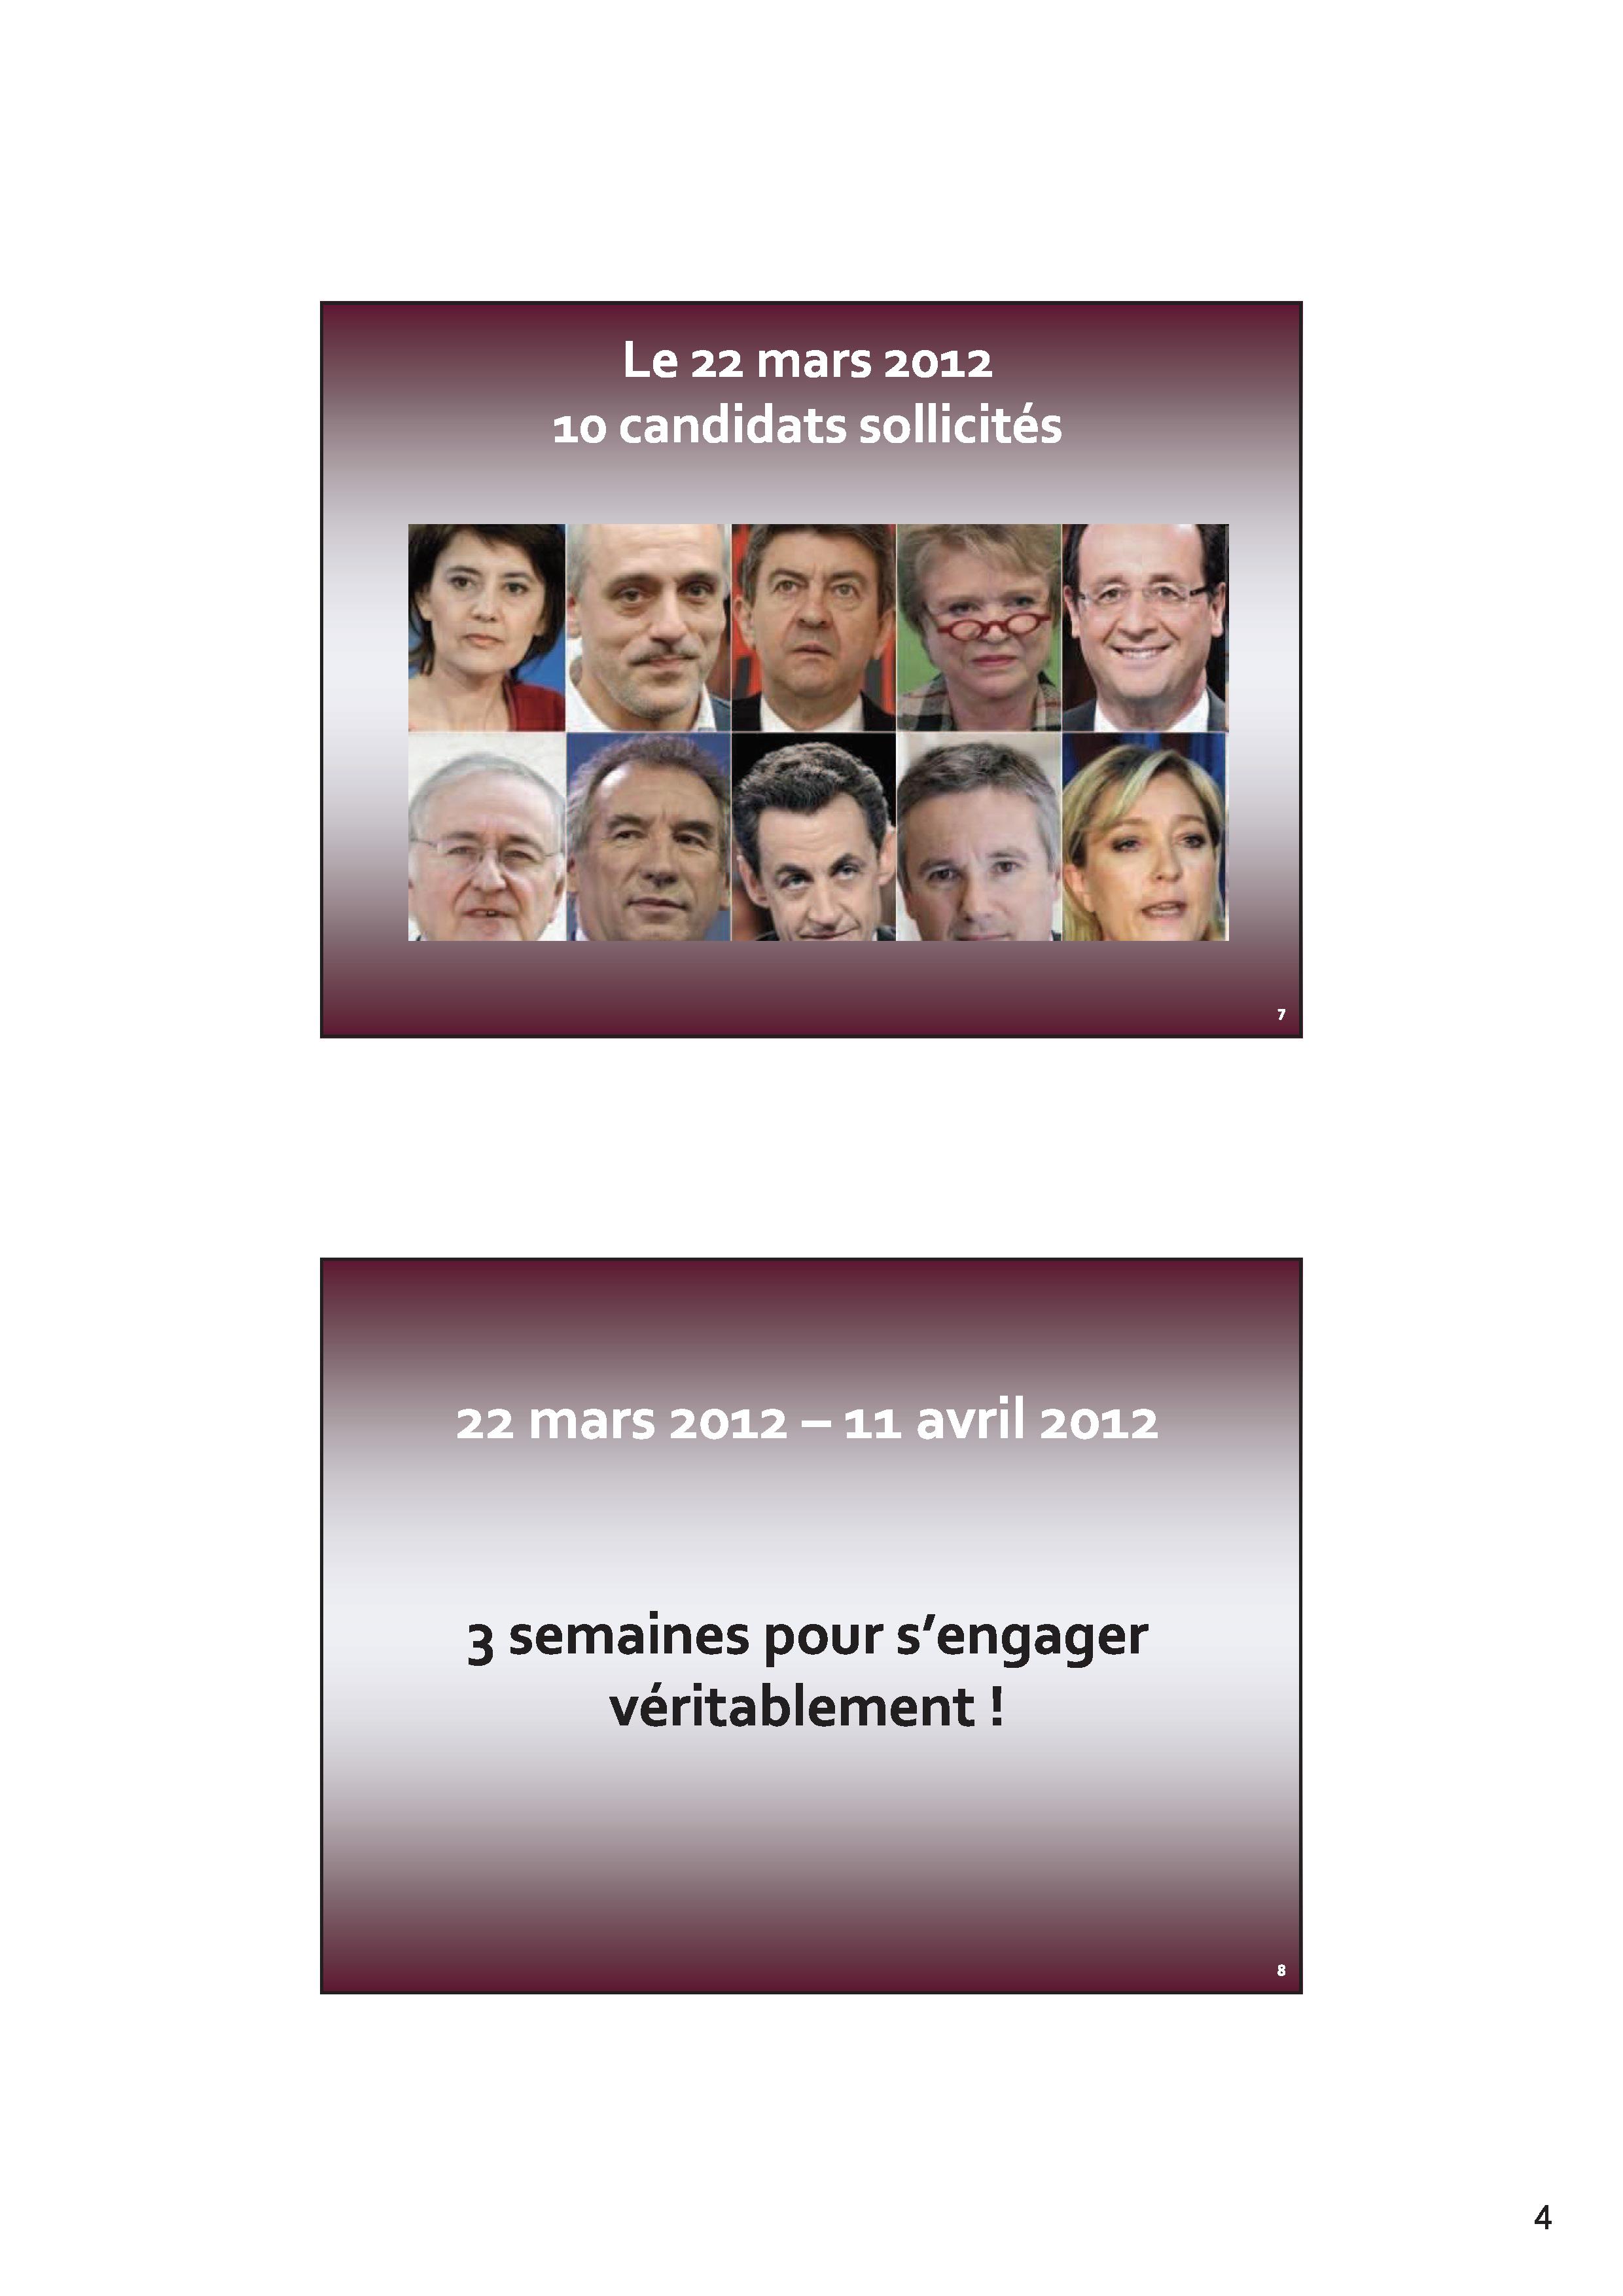 Alliance-dossier-presse-livre-blanc-11avr2012_Page_09.jpg